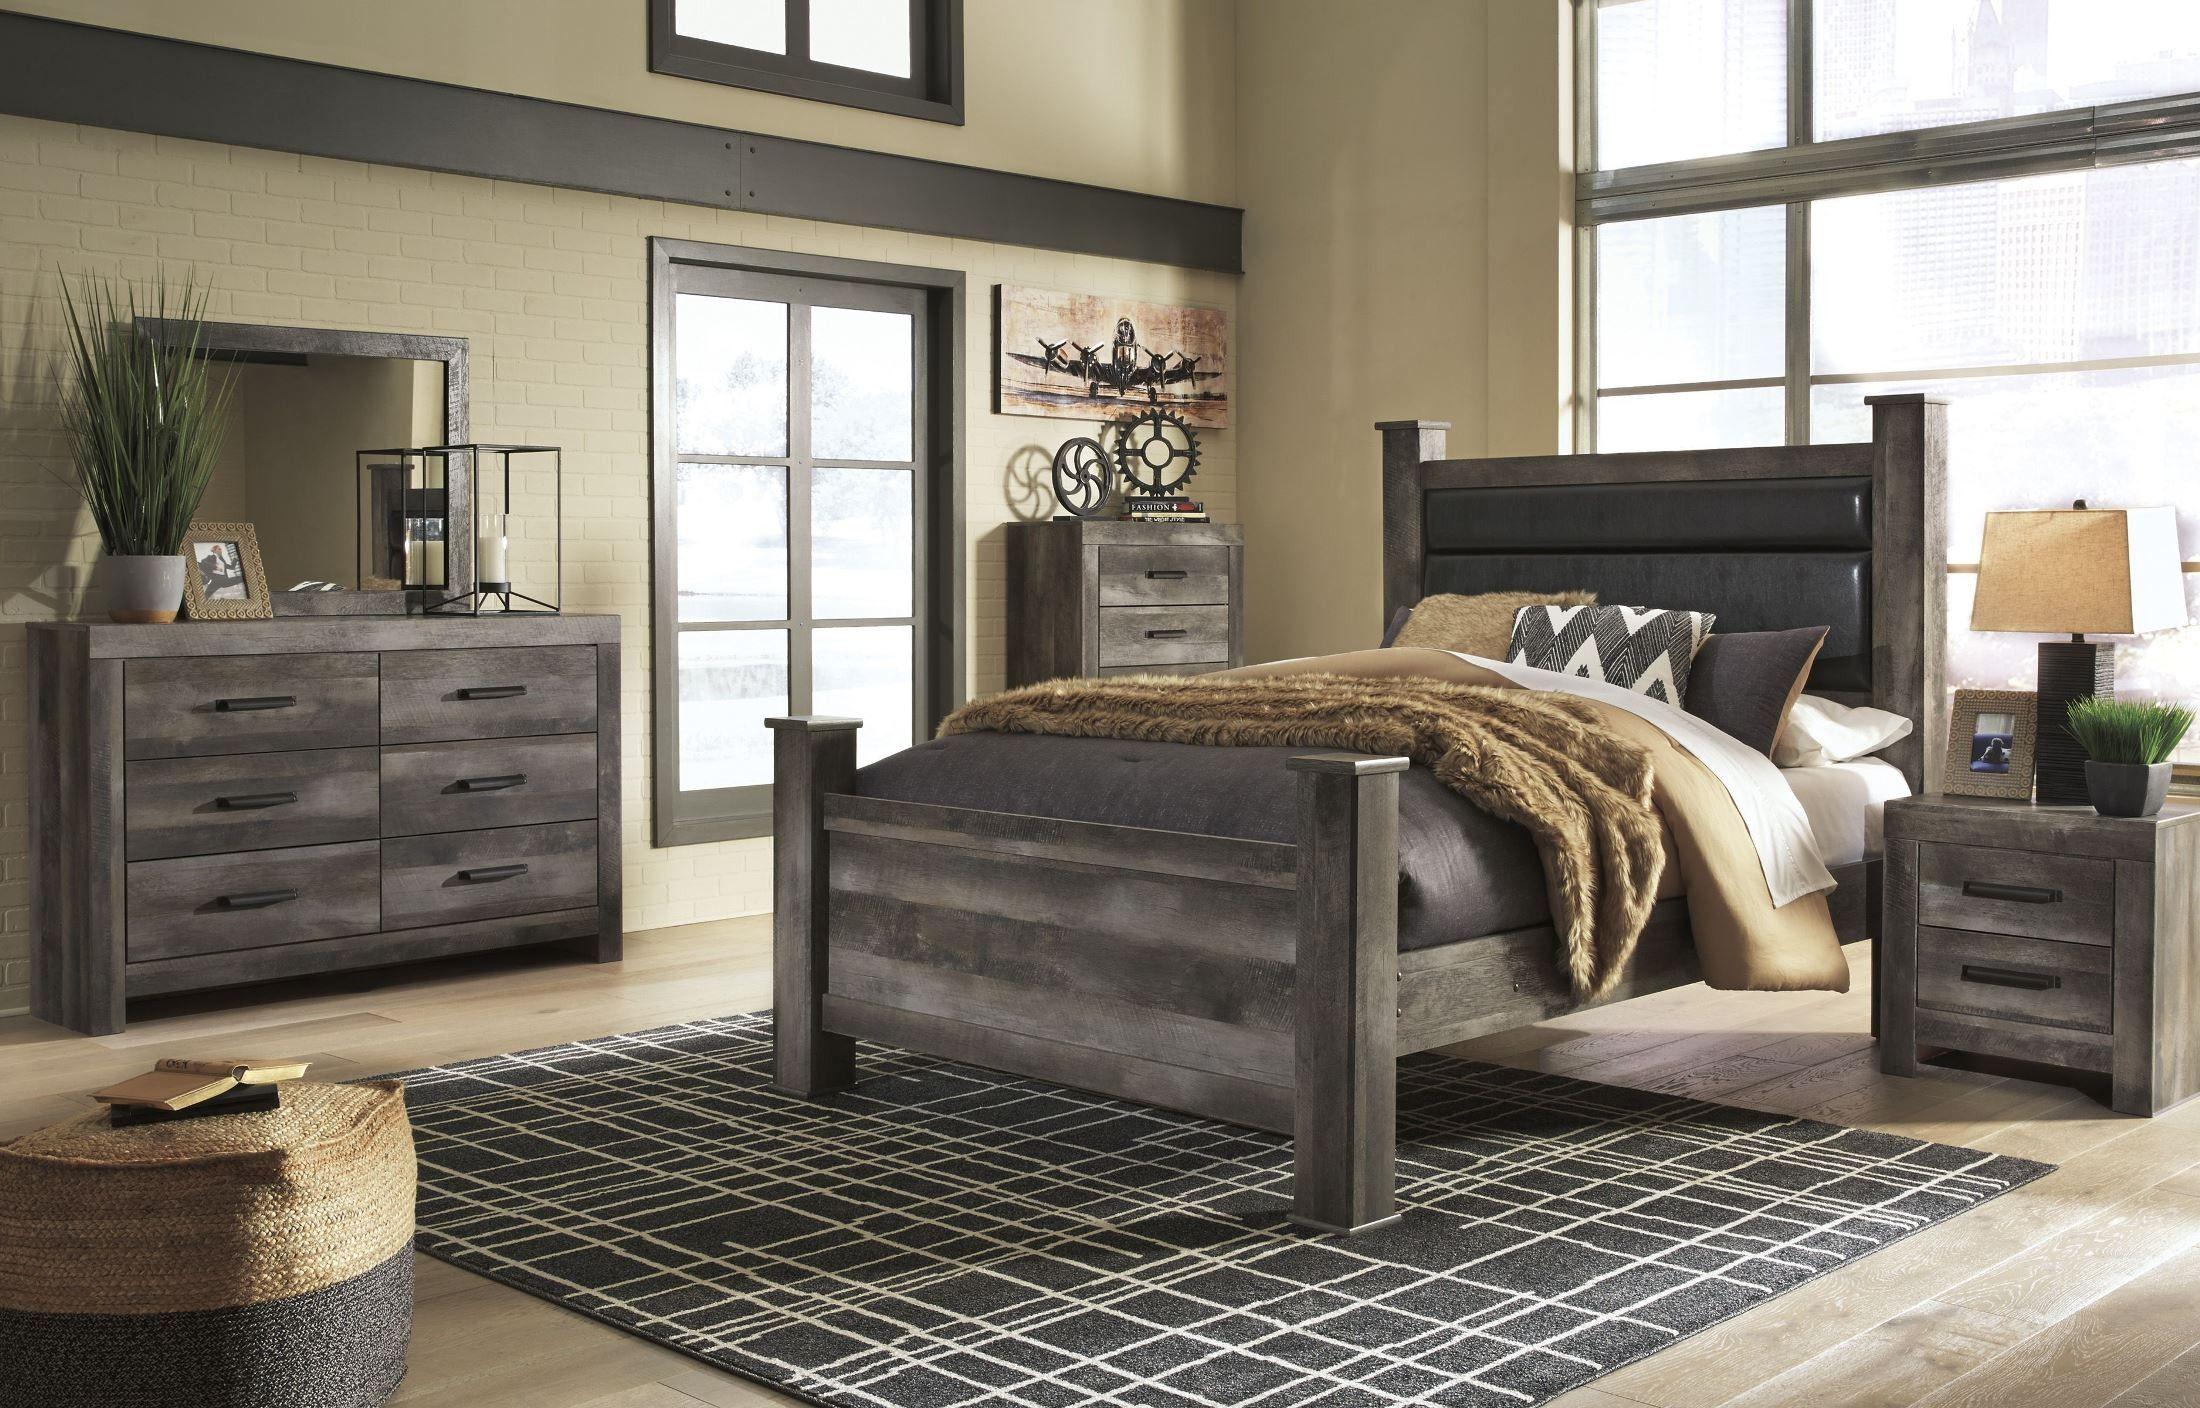 Wynnlow Gray Upholstered Poster Bedroom Set Bedroom